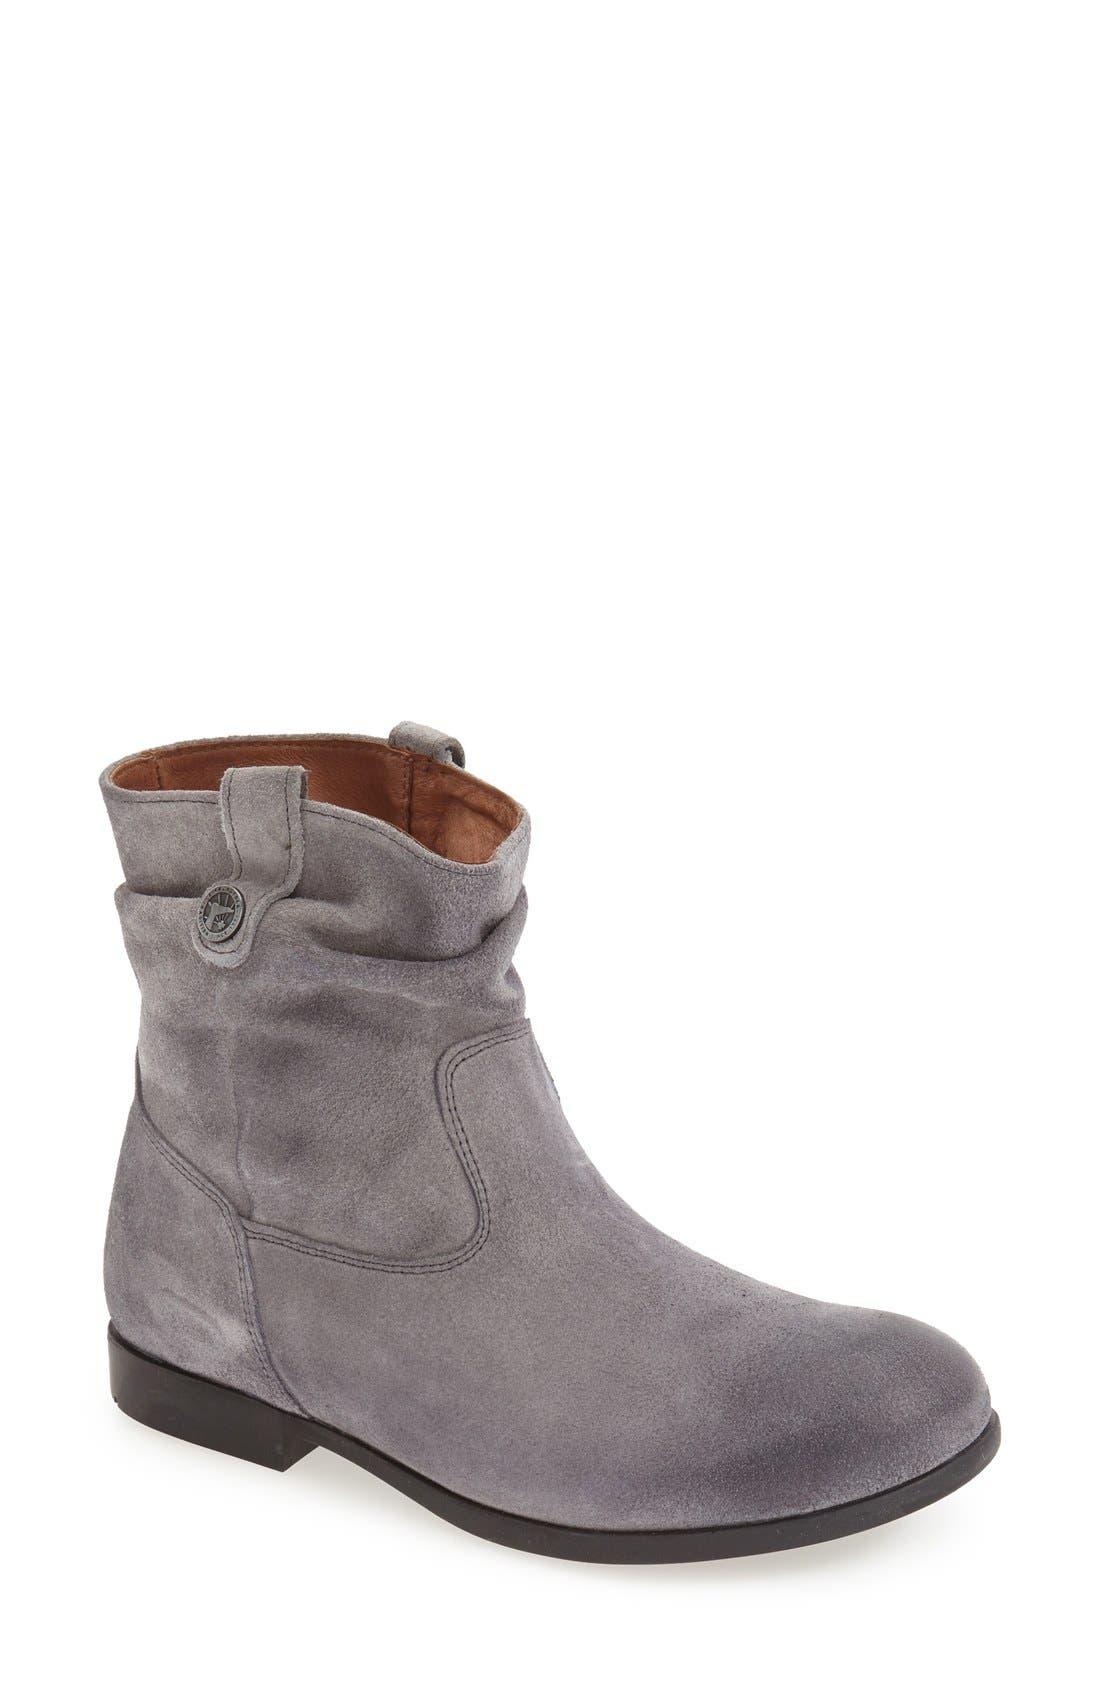 Alternate Image 1 Selected - Birkenstock 'Sarnia' Boot (Women)